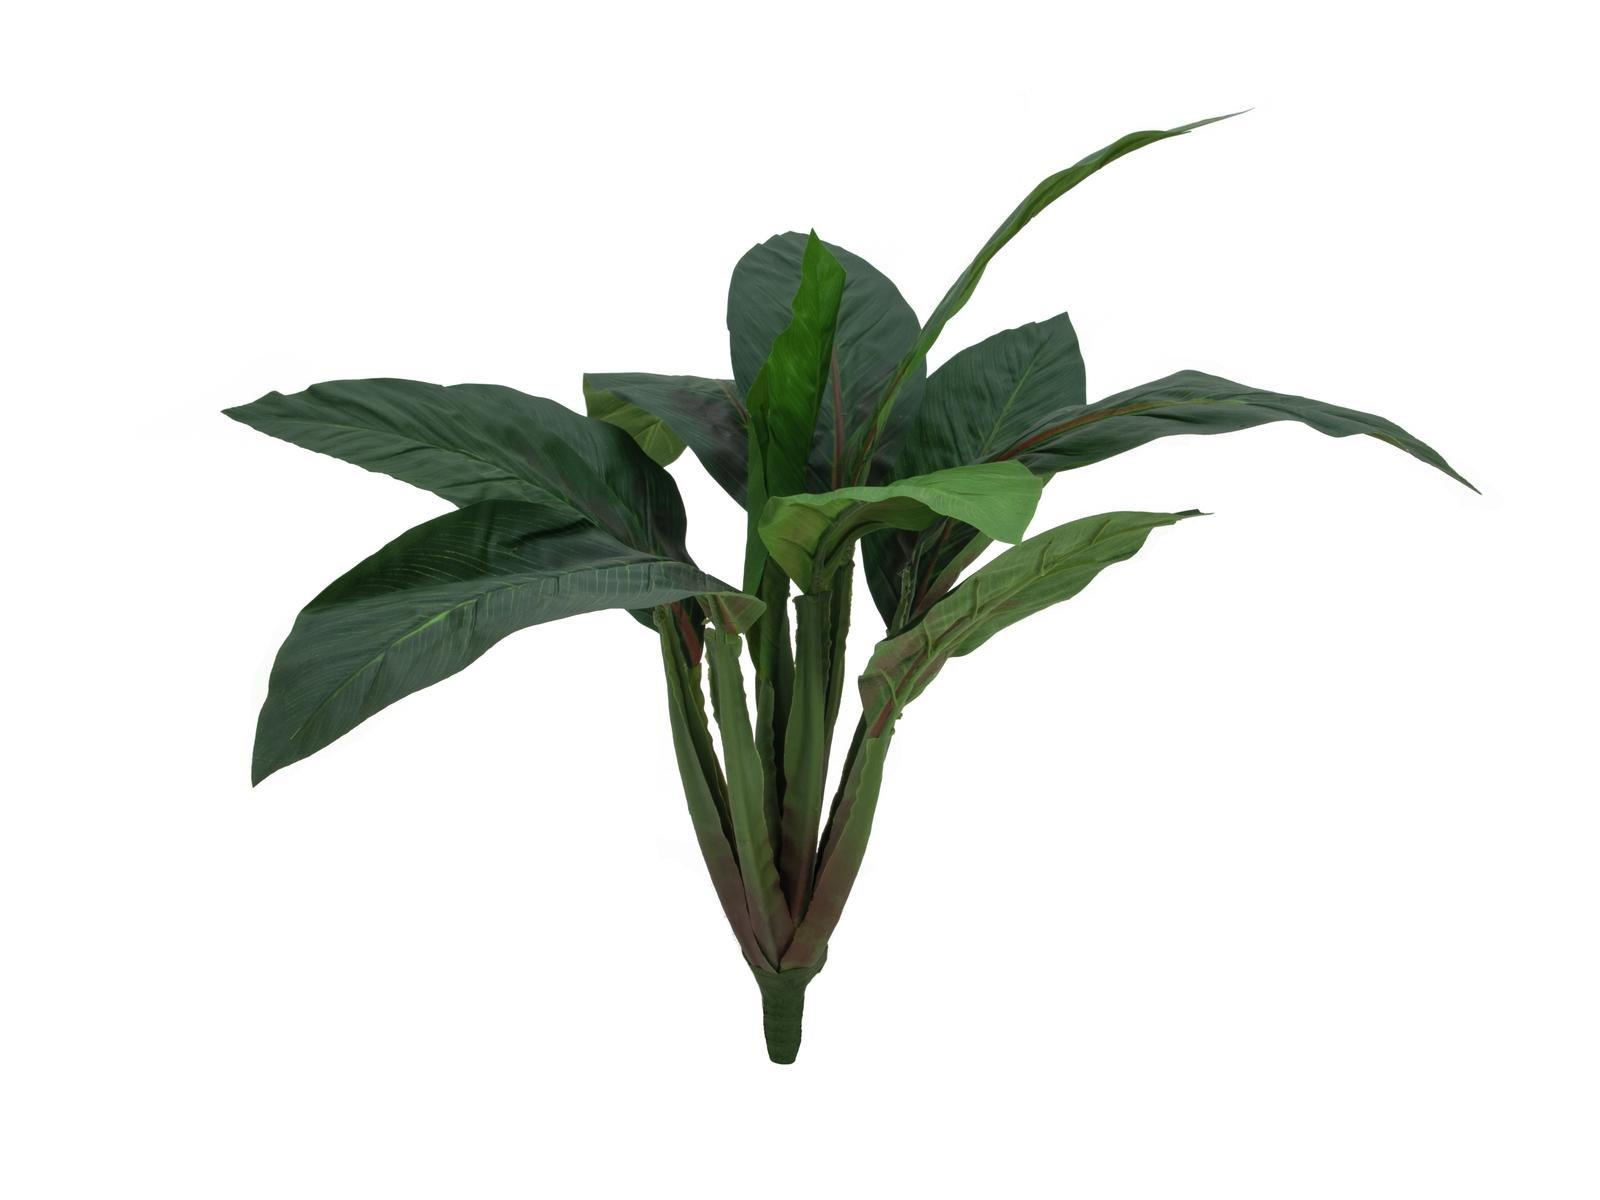 palmier-sagoutier-artificiel